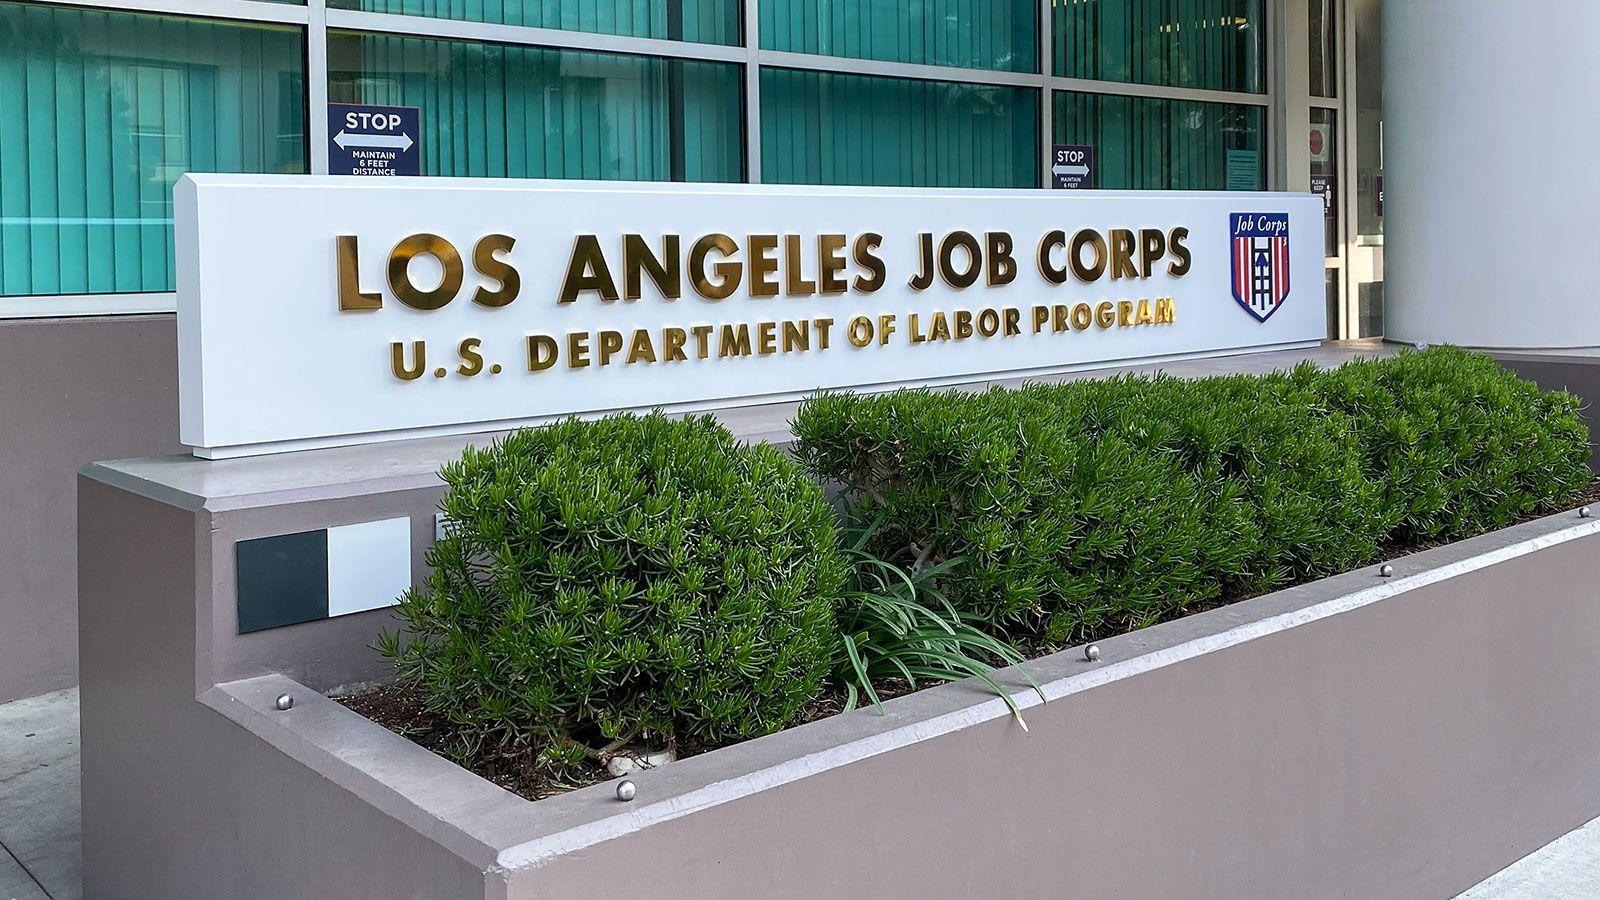 LA job corps monument sign